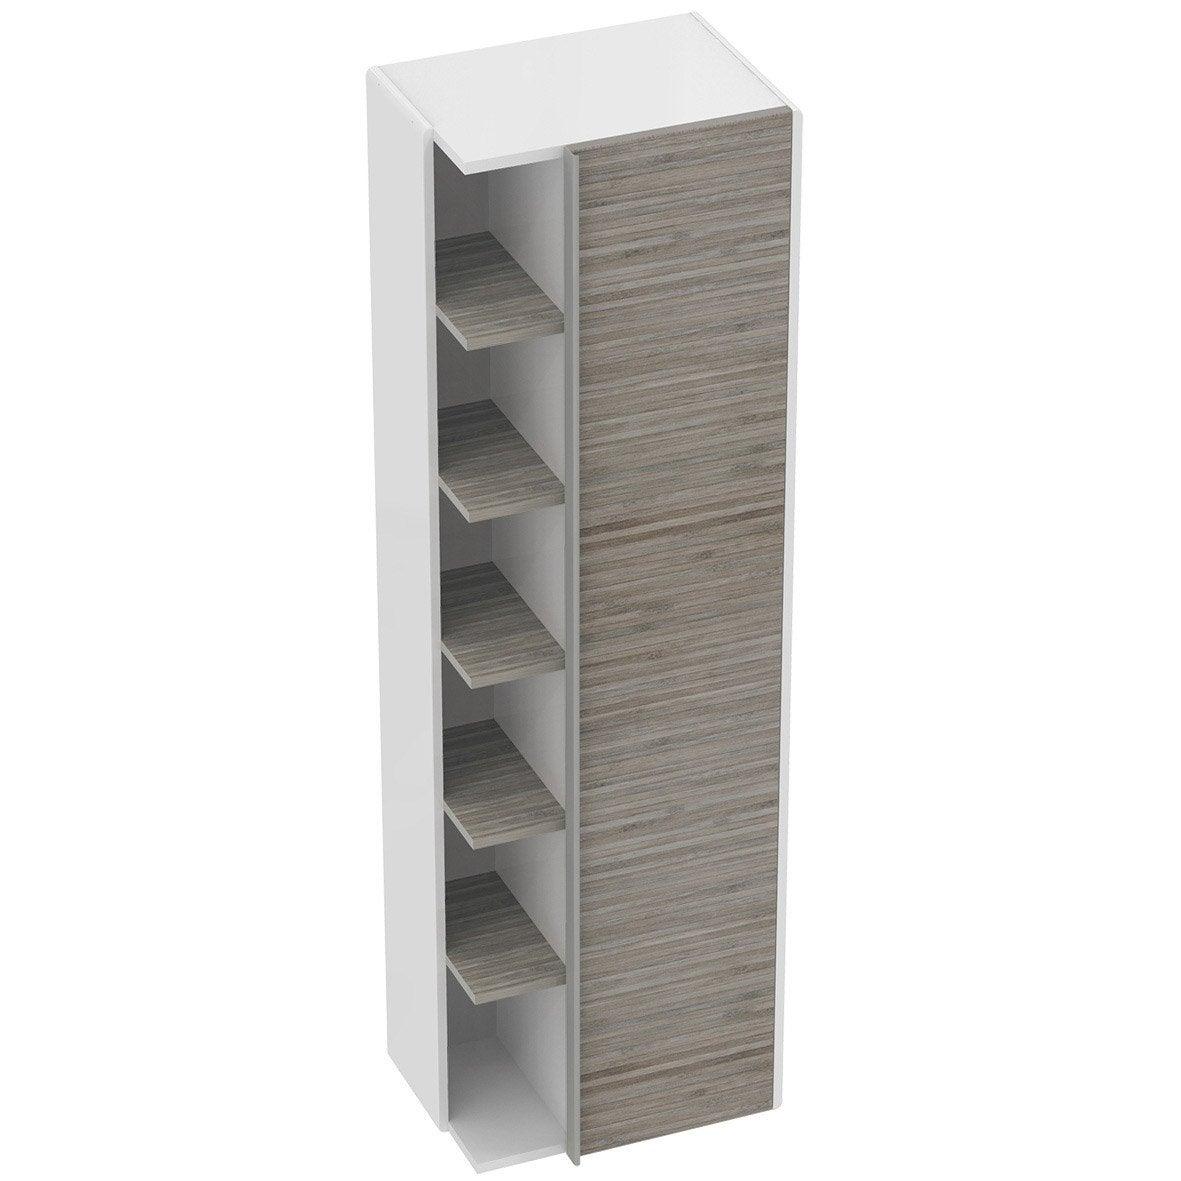 colonne x x cm imitation bambou. Black Bedroom Furniture Sets. Home Design Ideas